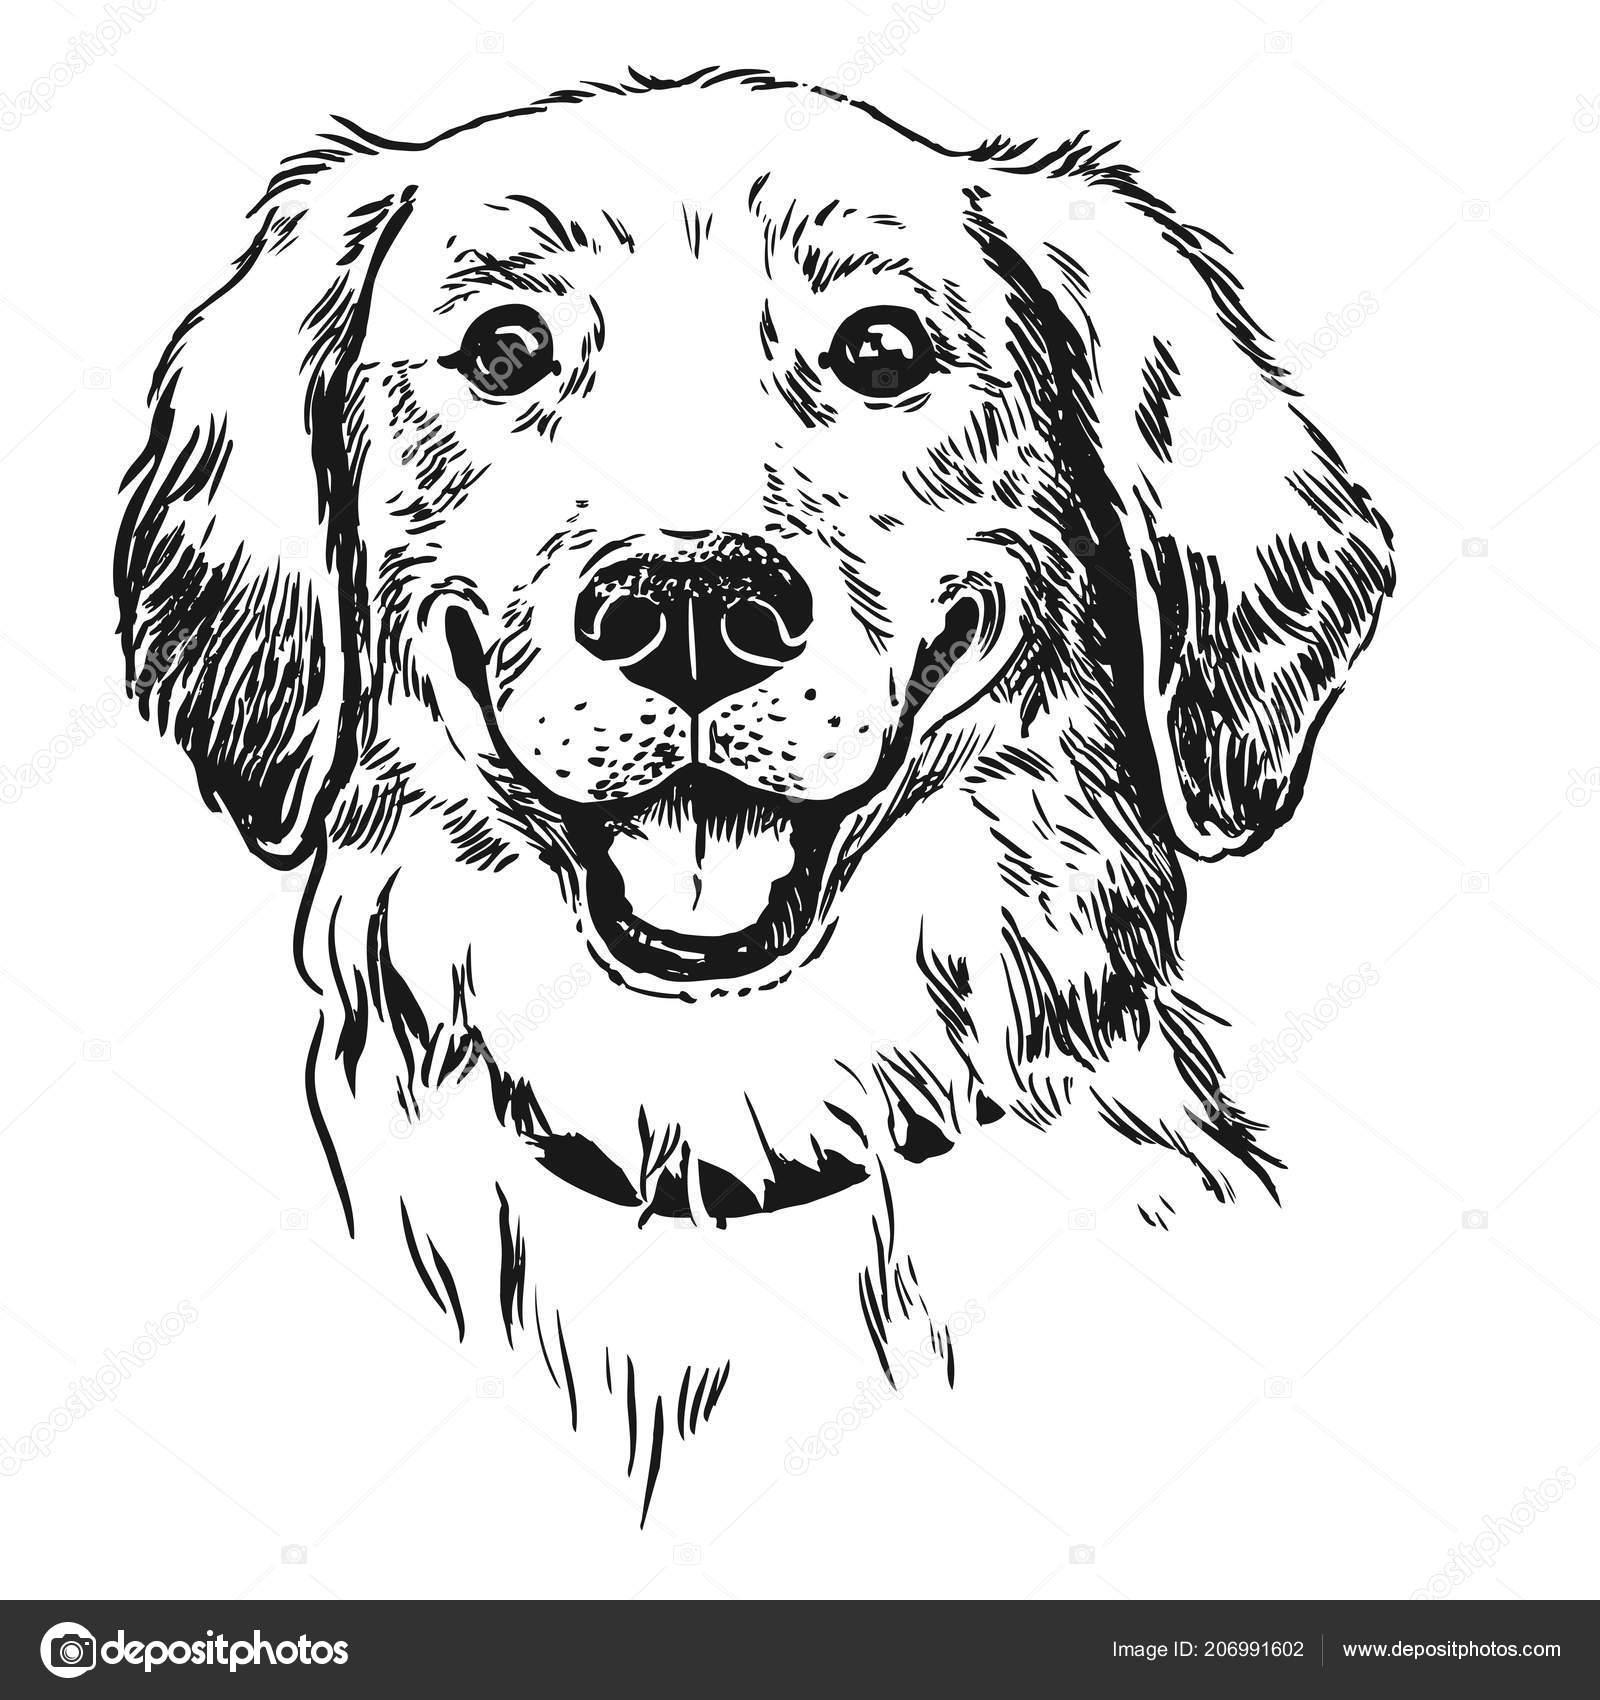 Perro Golden Retriever Sonriendo Con Lengua Fuera Pluma Tinta Estilo